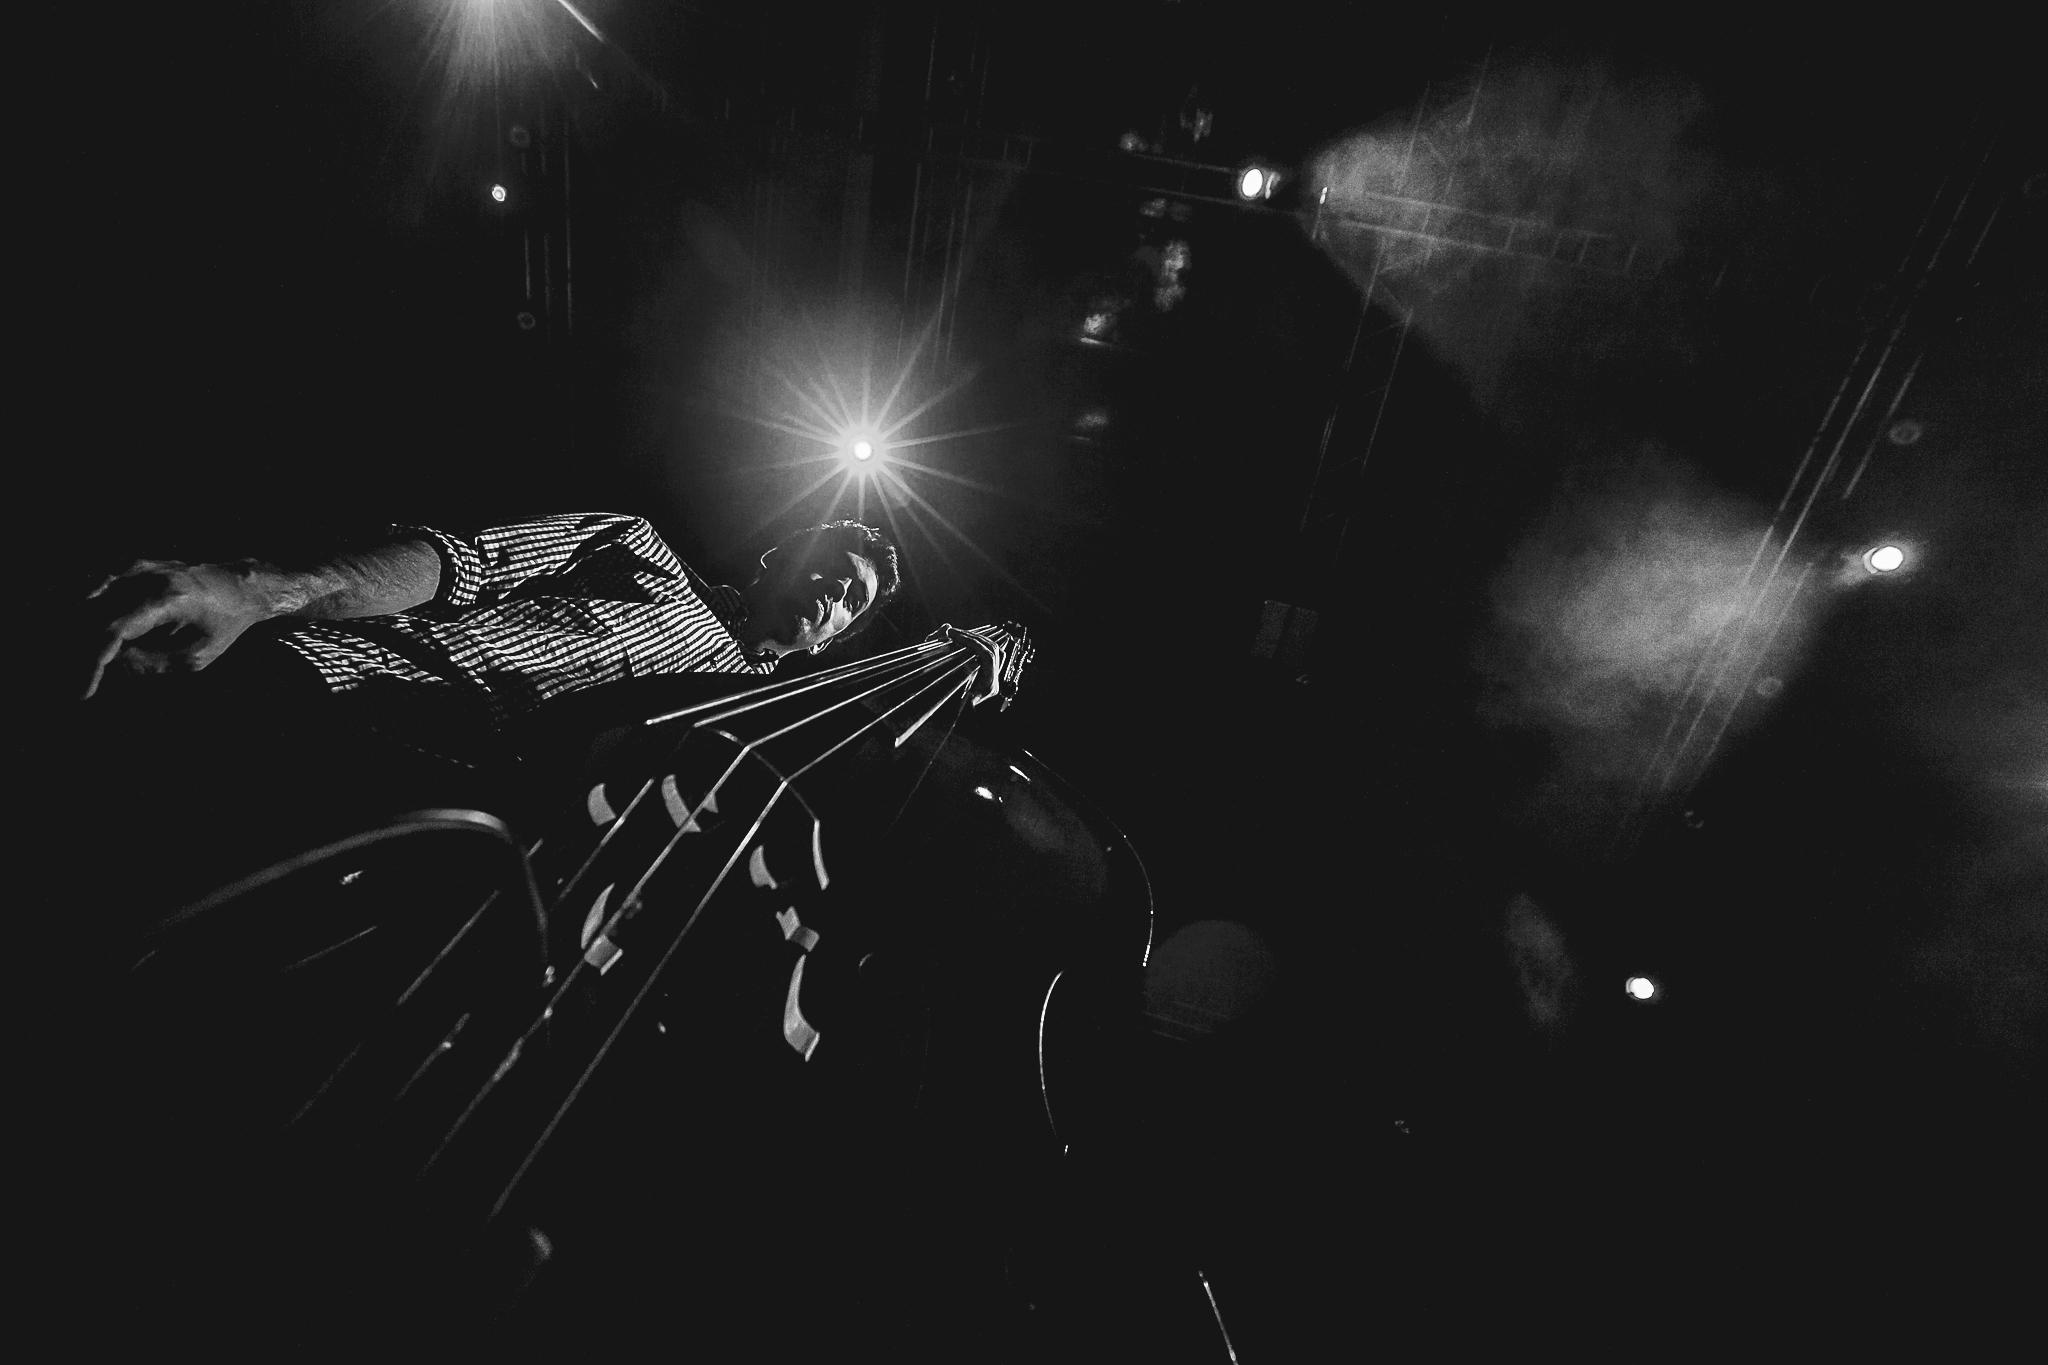 Edu Mundo Sala Suggia Casa da Musica Photography Fotografia On Stage Concert bonjourmolotov Andre Gigante 13